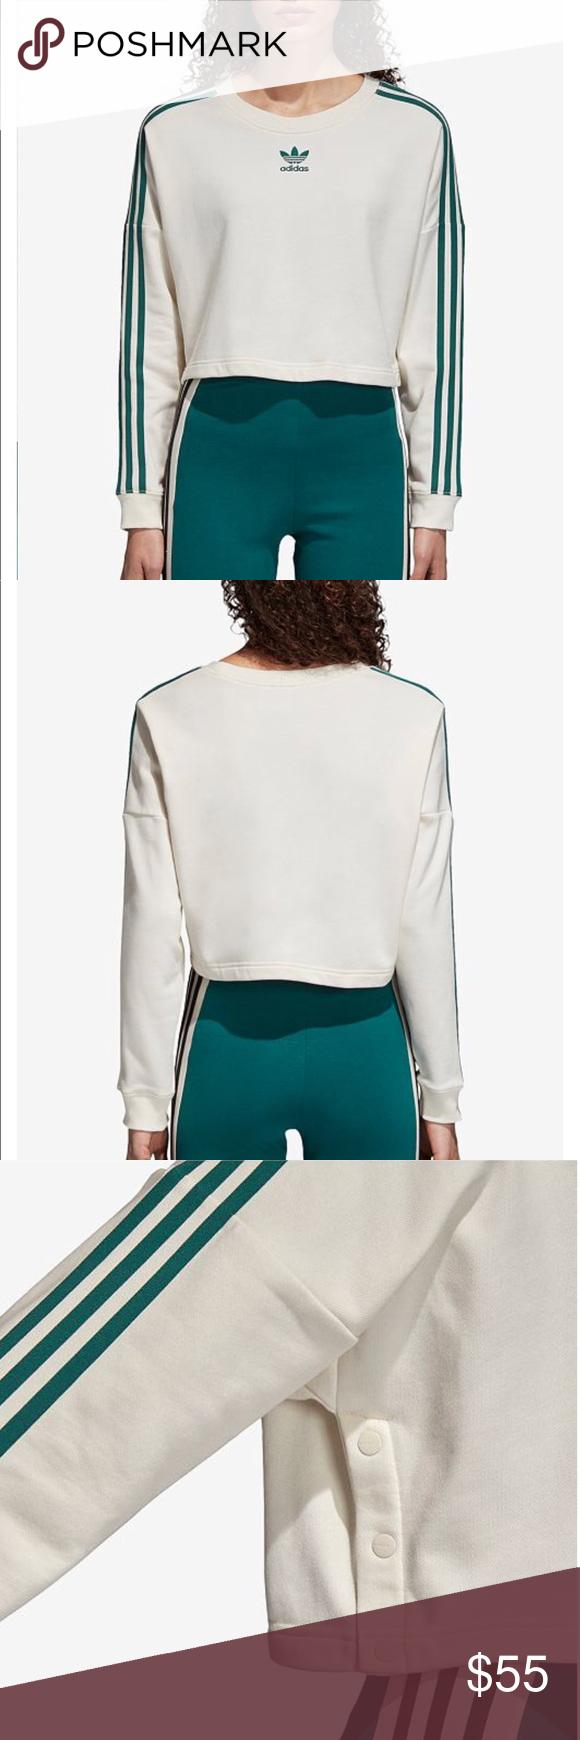 Adidas Adibreak Cropped Sweatshirt Adidas Adibreak Cropped Sweatshirt Cream With Green Stripes Product Details In Crop Sweatshirt Clothes Design Sweatshirts [ 1740 x 580 Pixel ]